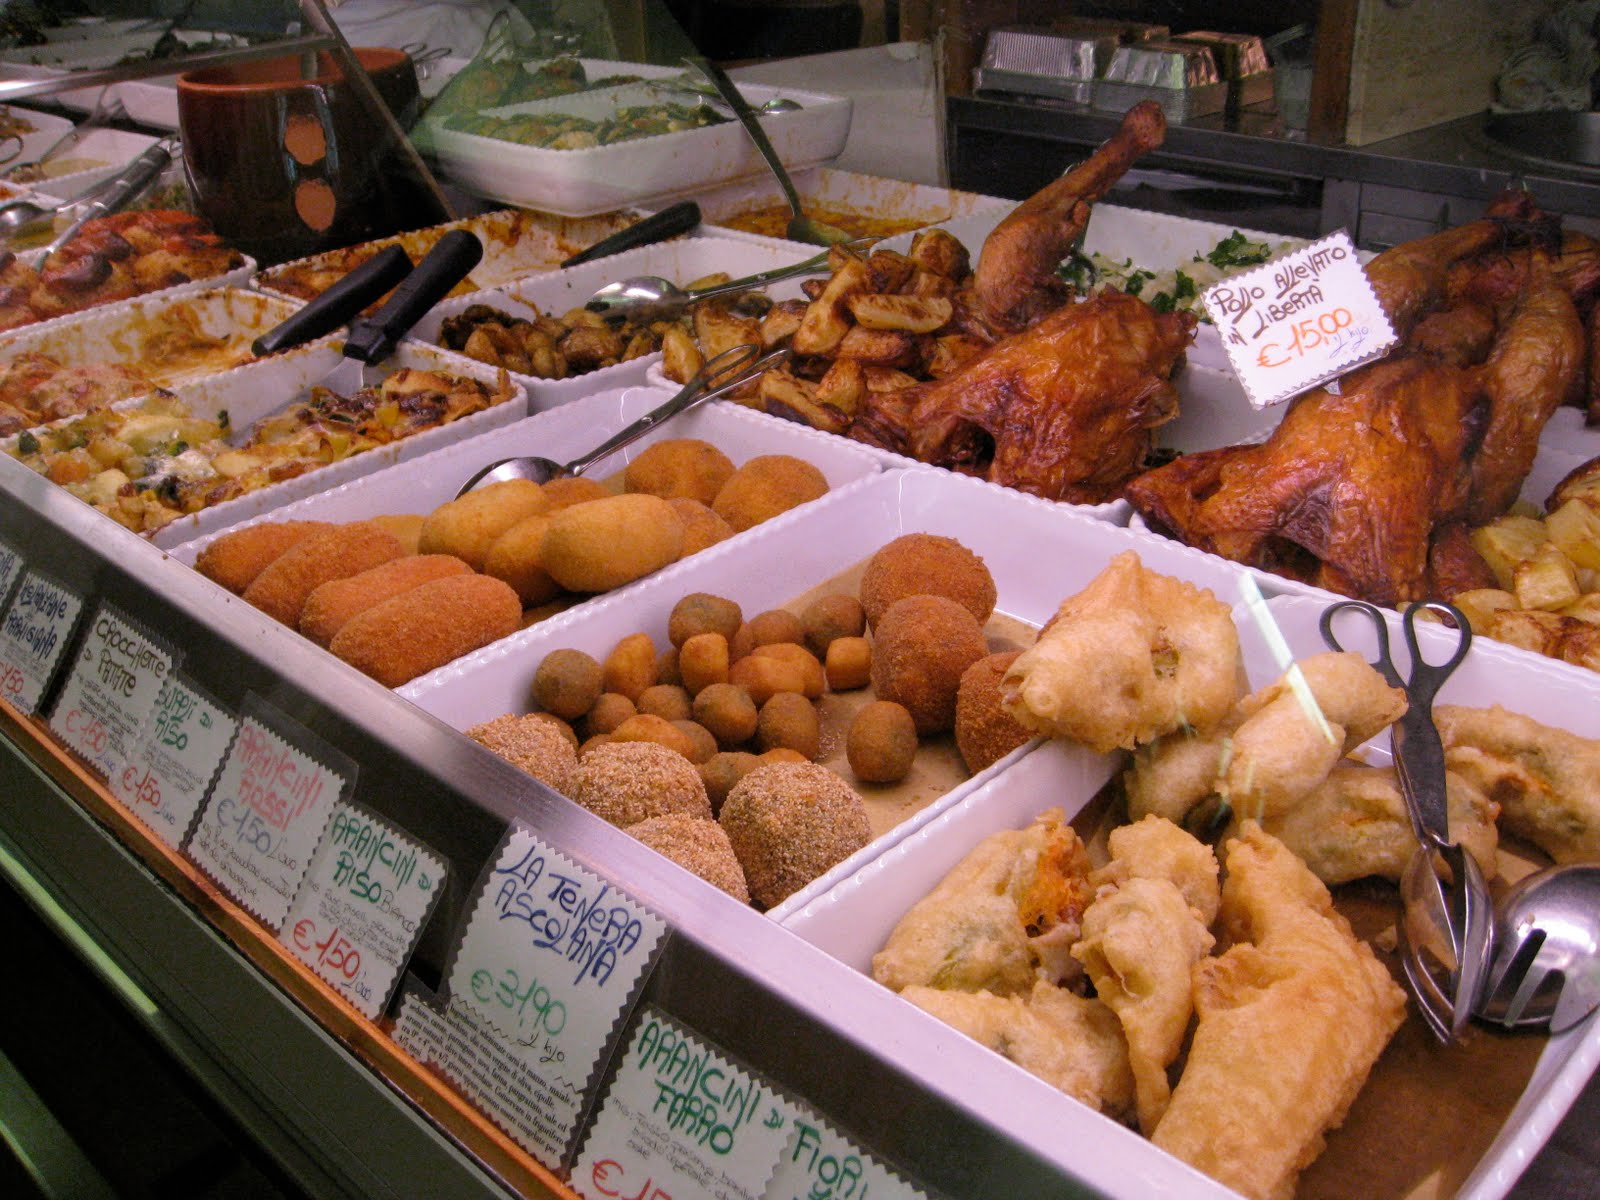 Volpetti Gourmet Food Store